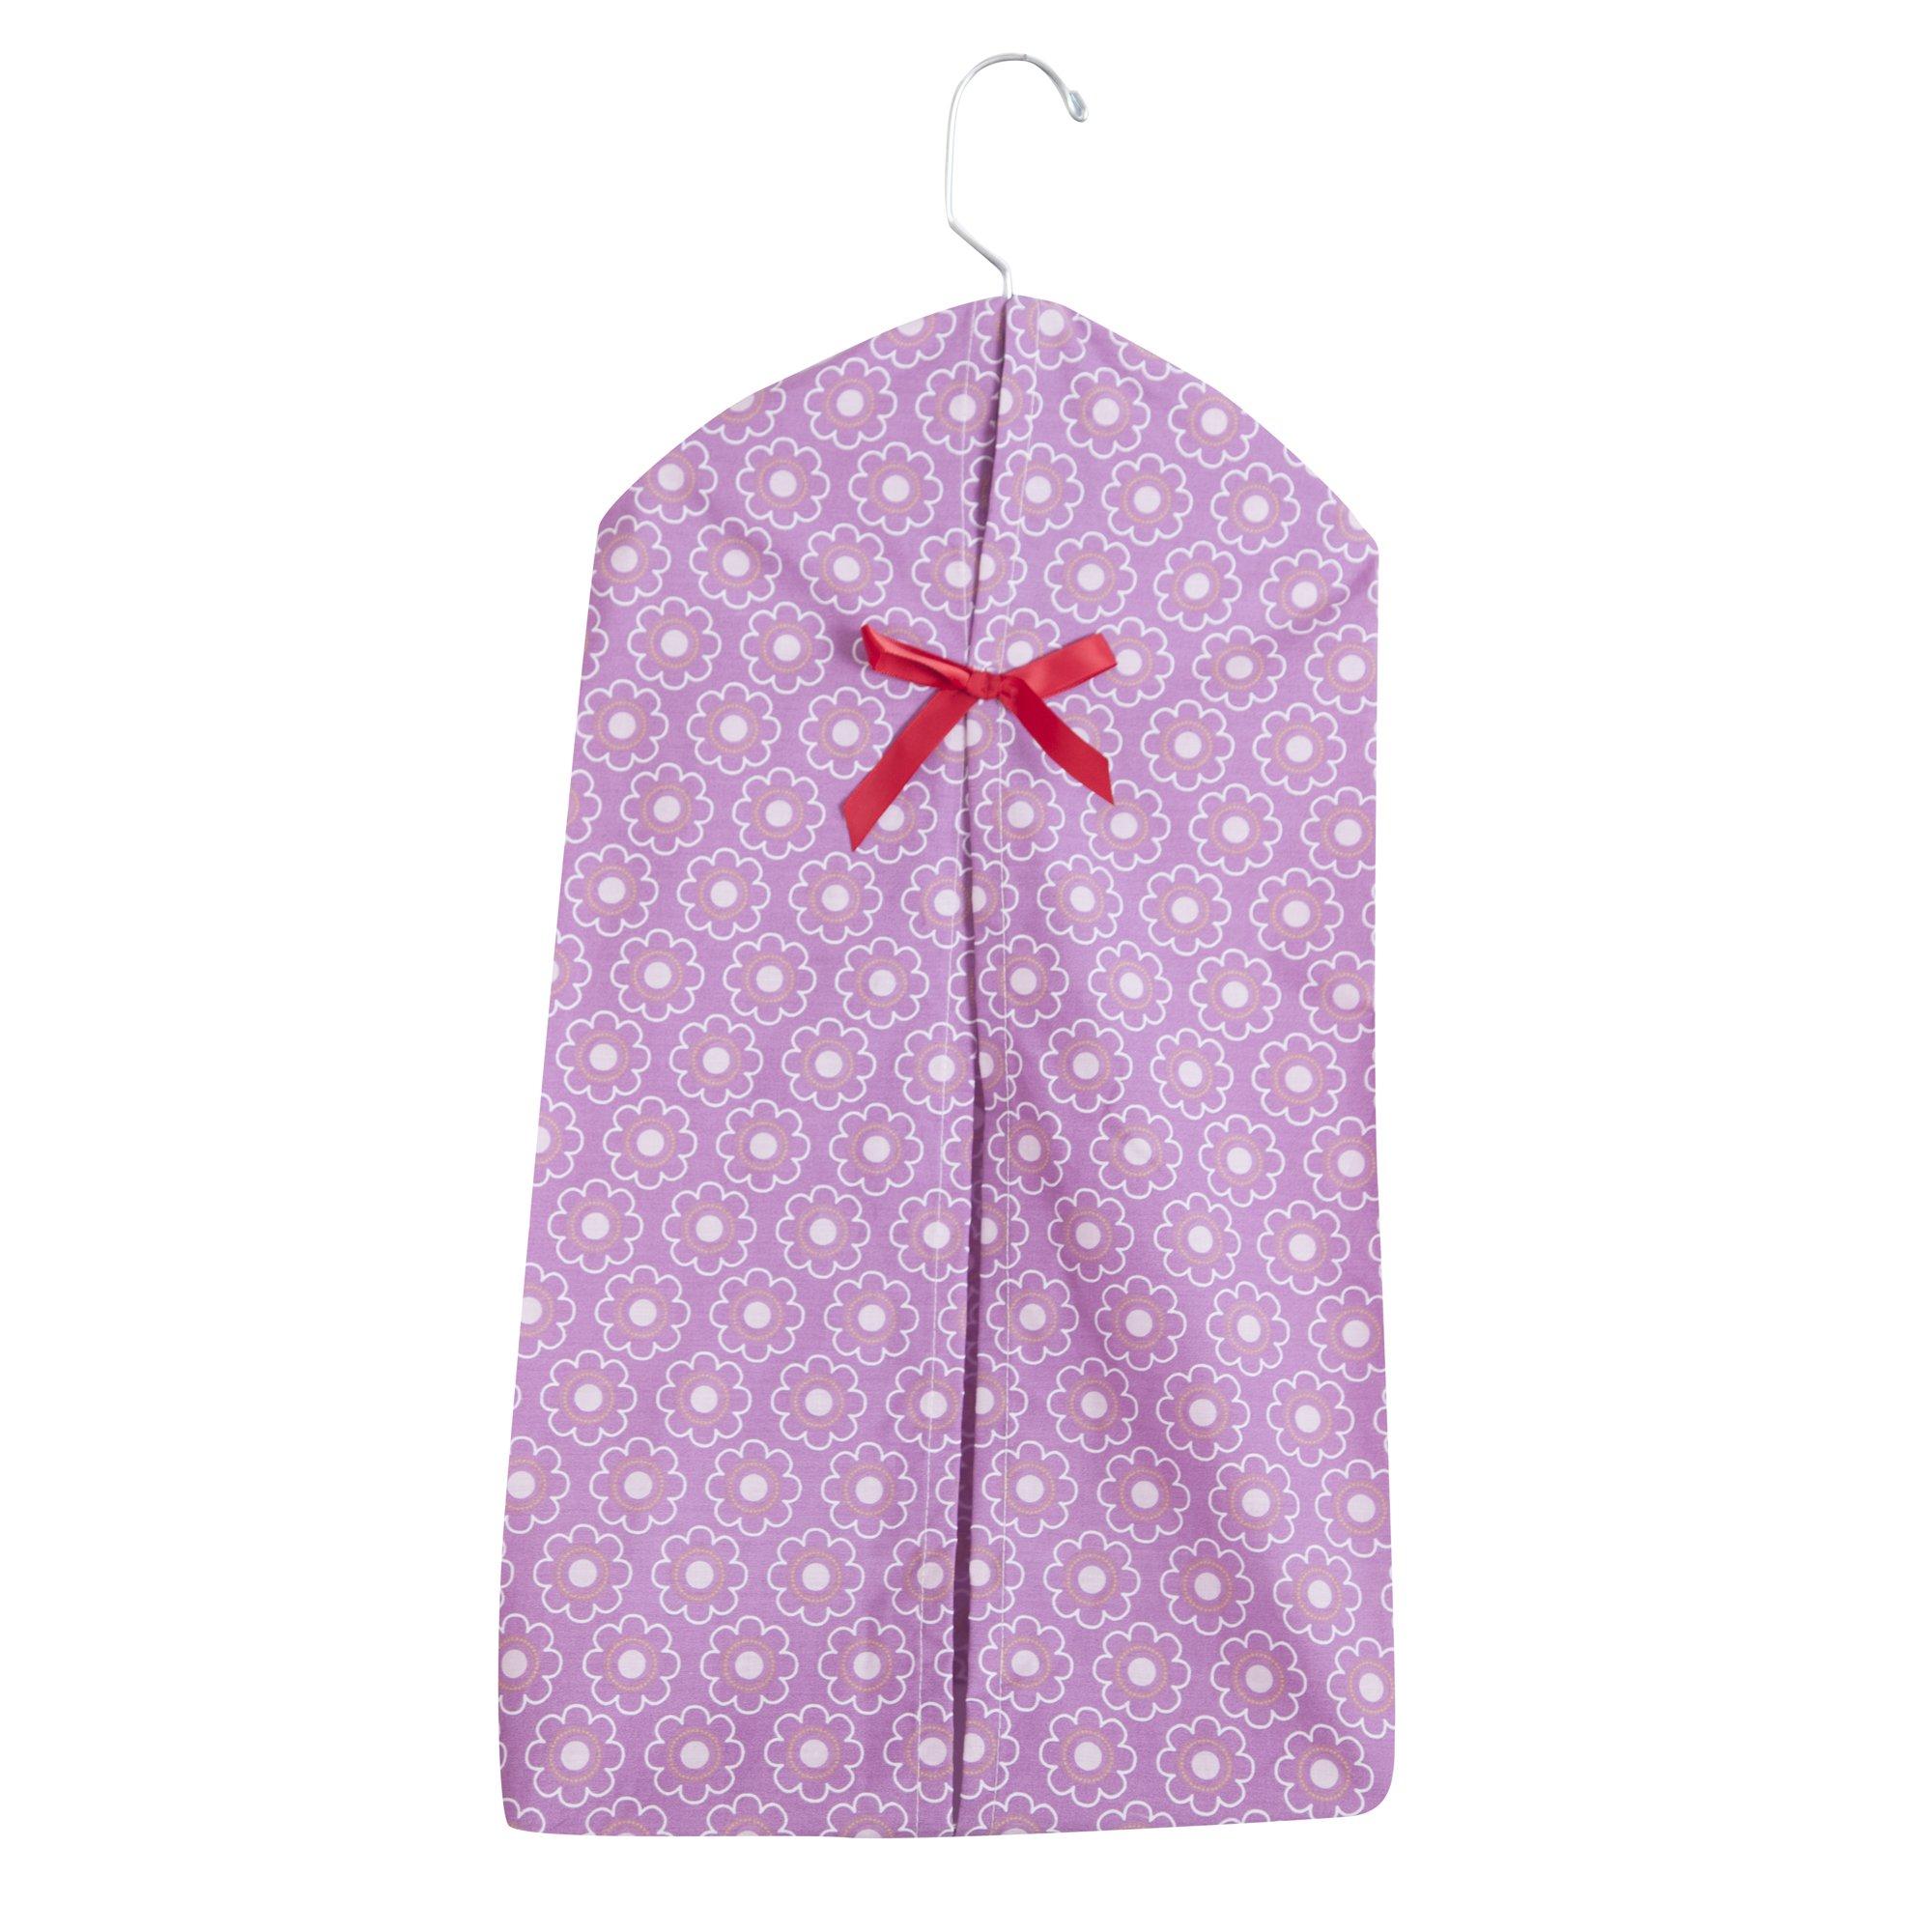 Bedtime Originals Lavender Woods Diaper Stacker